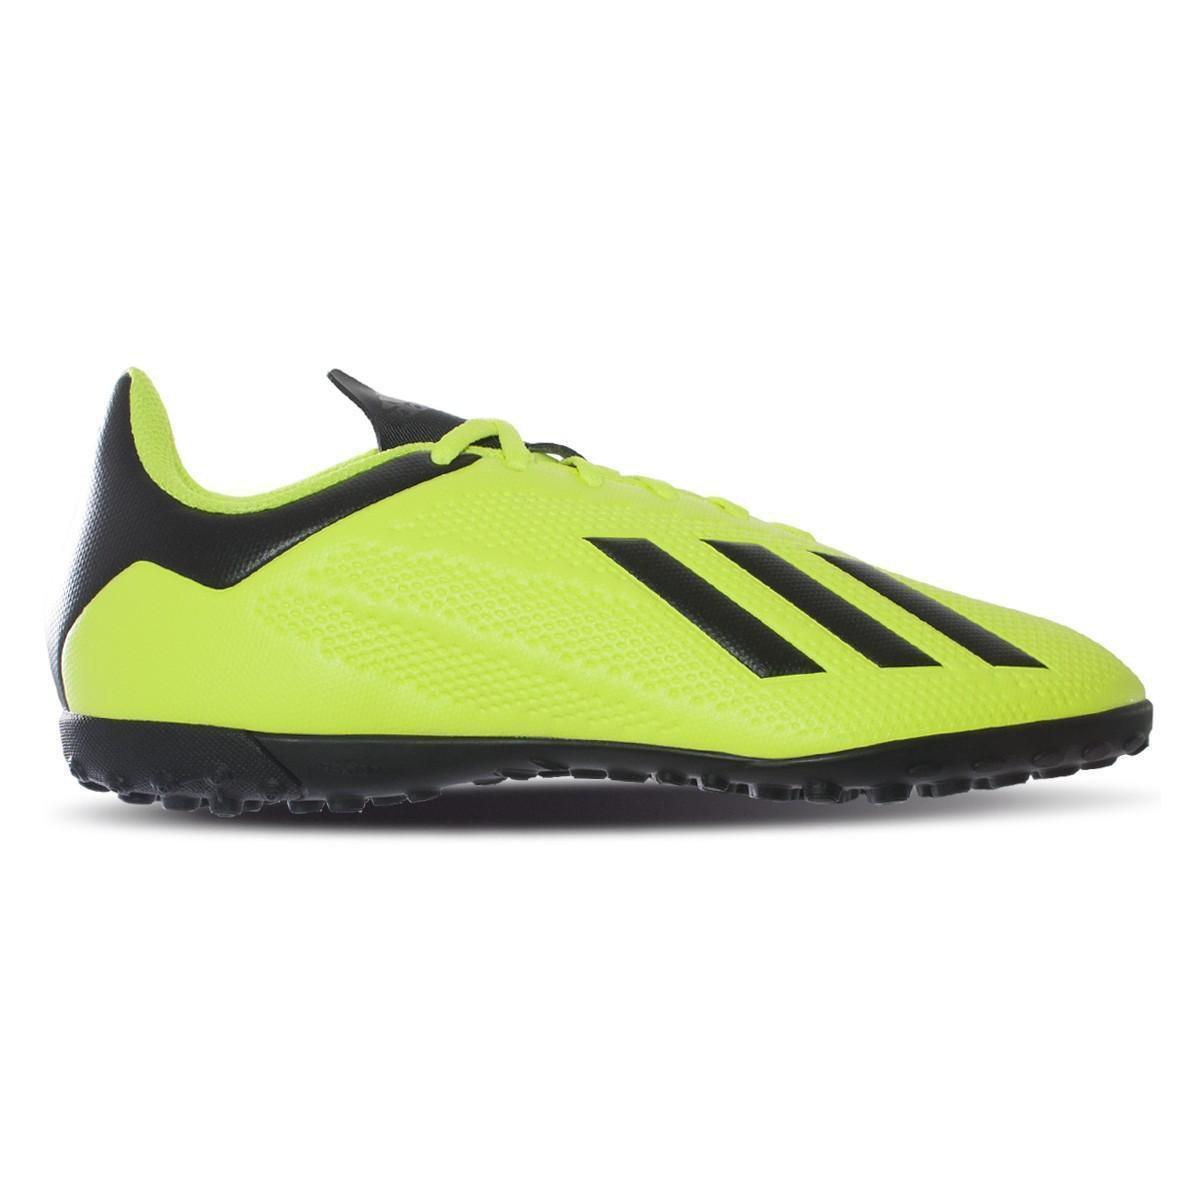 Chuteira Society Adidas X Tango 18 4 TF - Preto e verde - Compre ... bd1bfb9516b9b